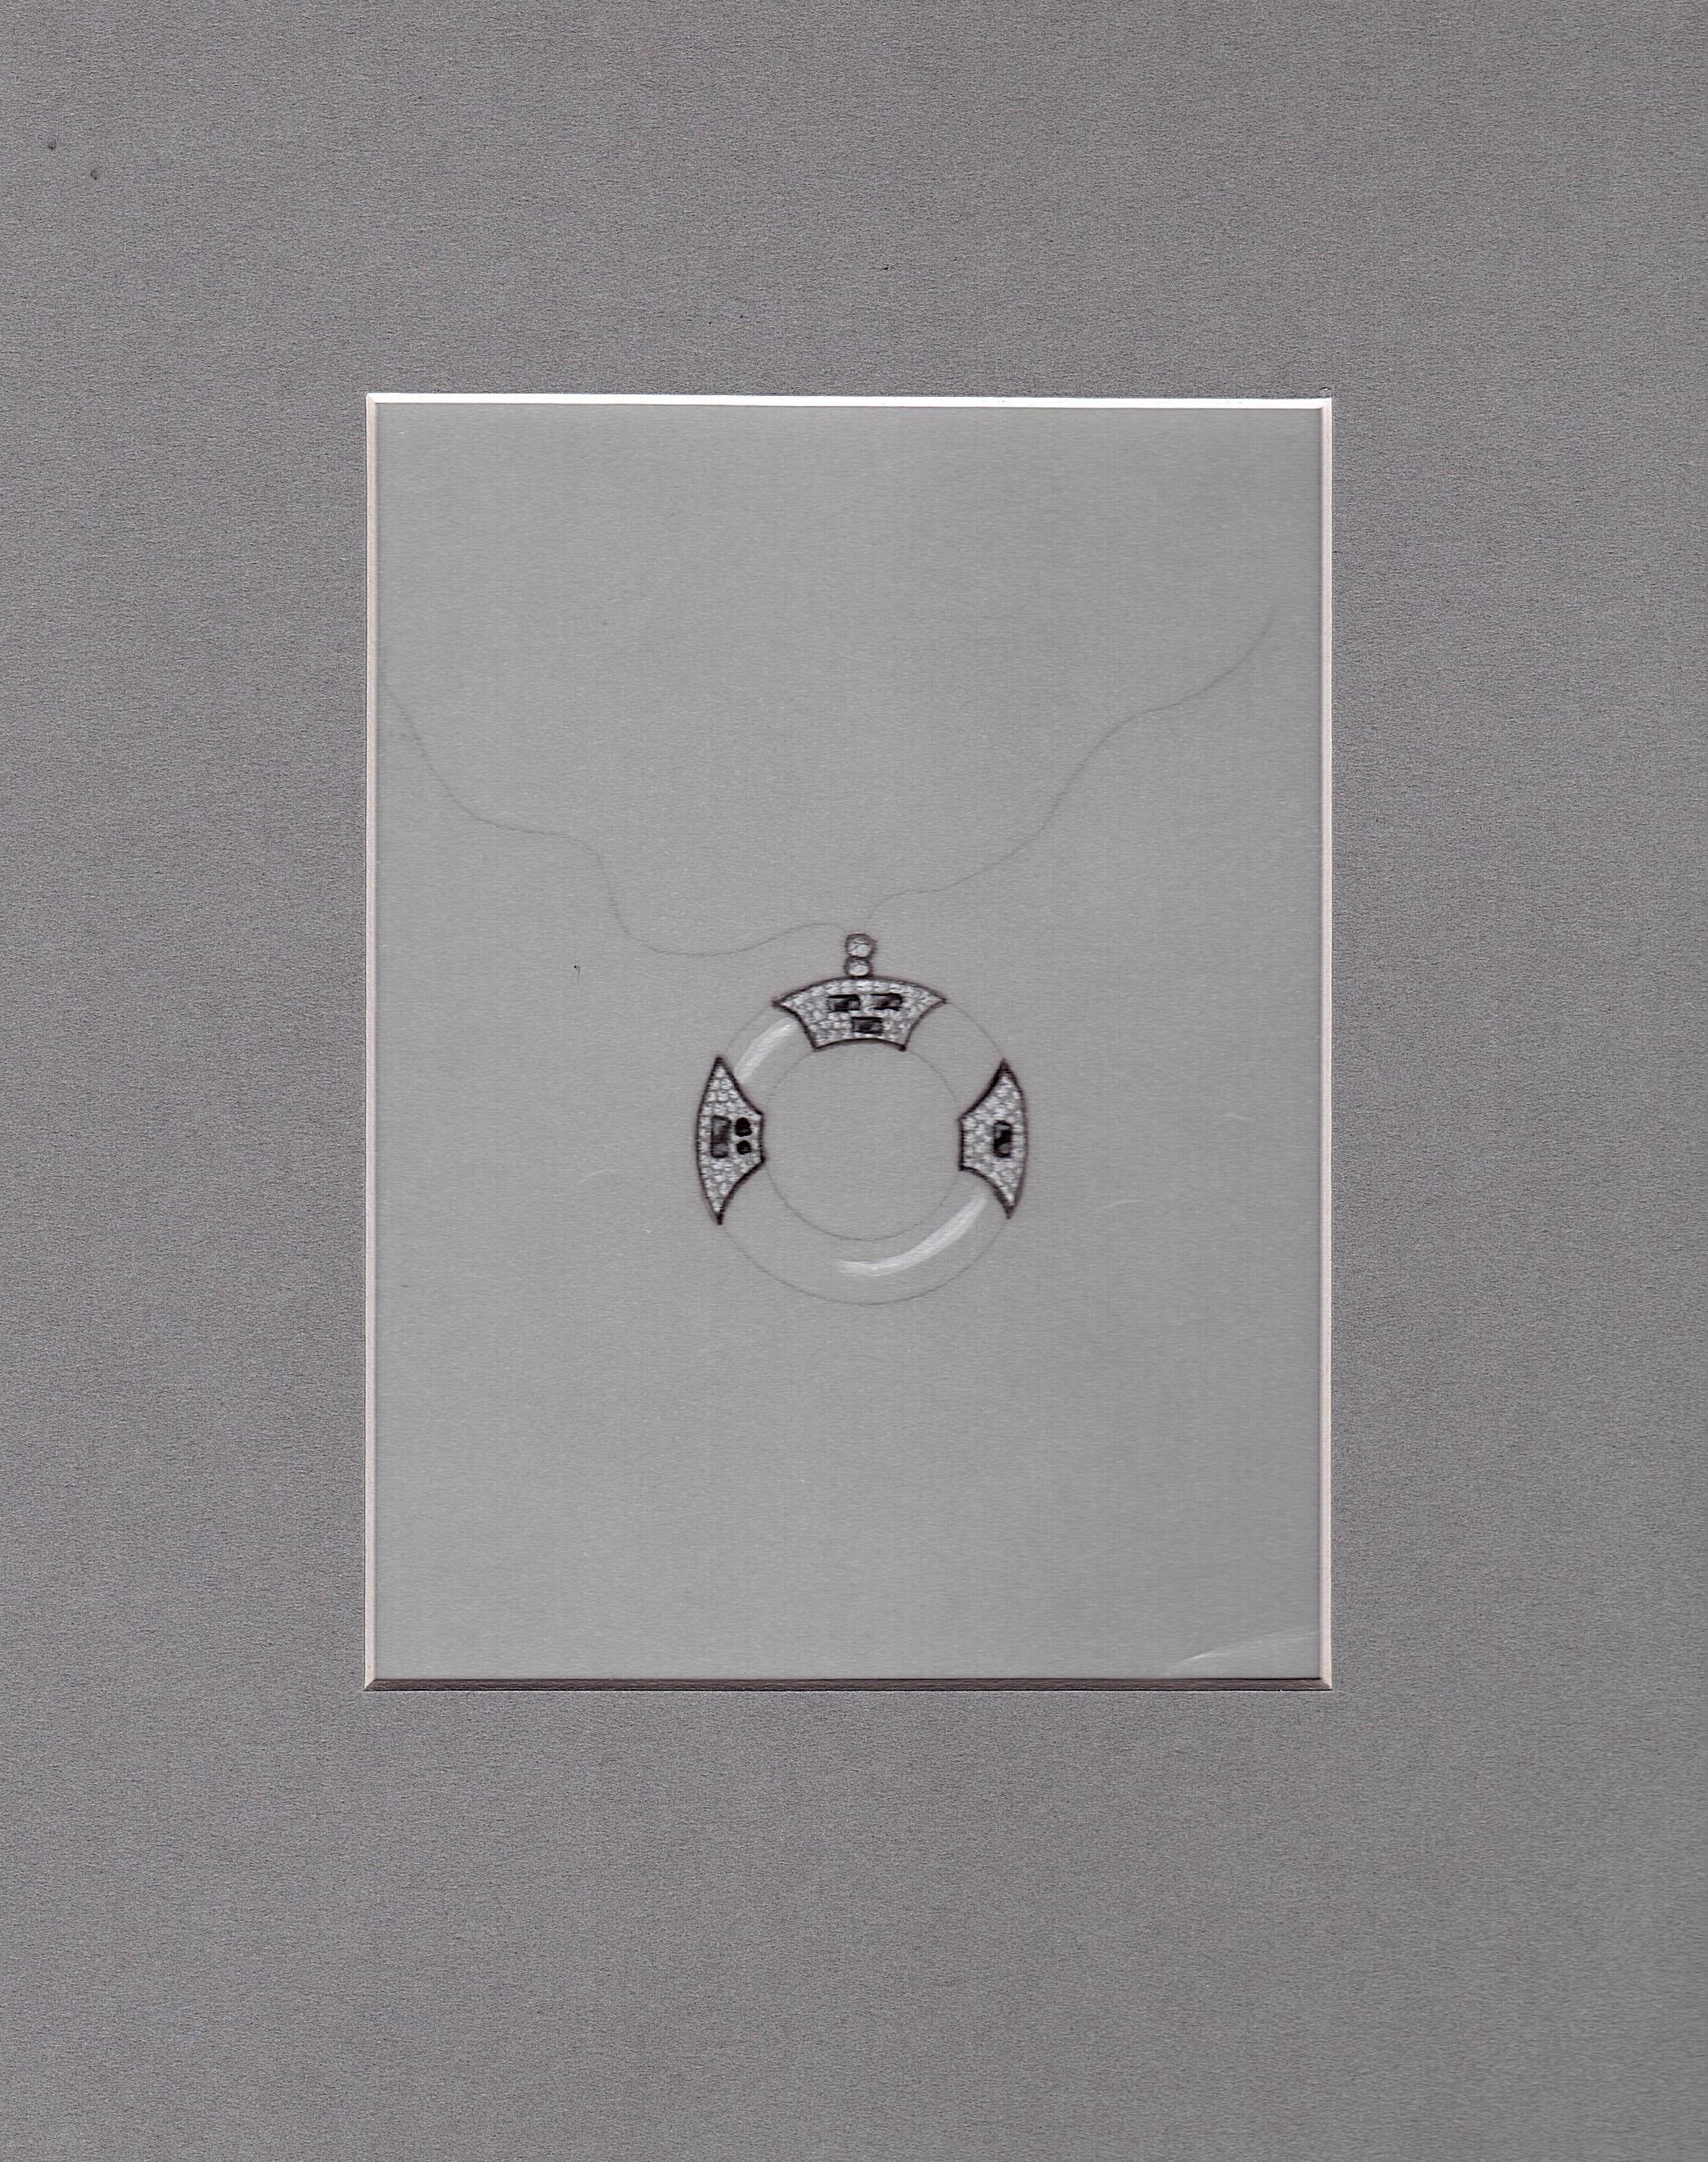 morse-code-onyx-and-diamond-pendant-necklace-design-drawing.jpg